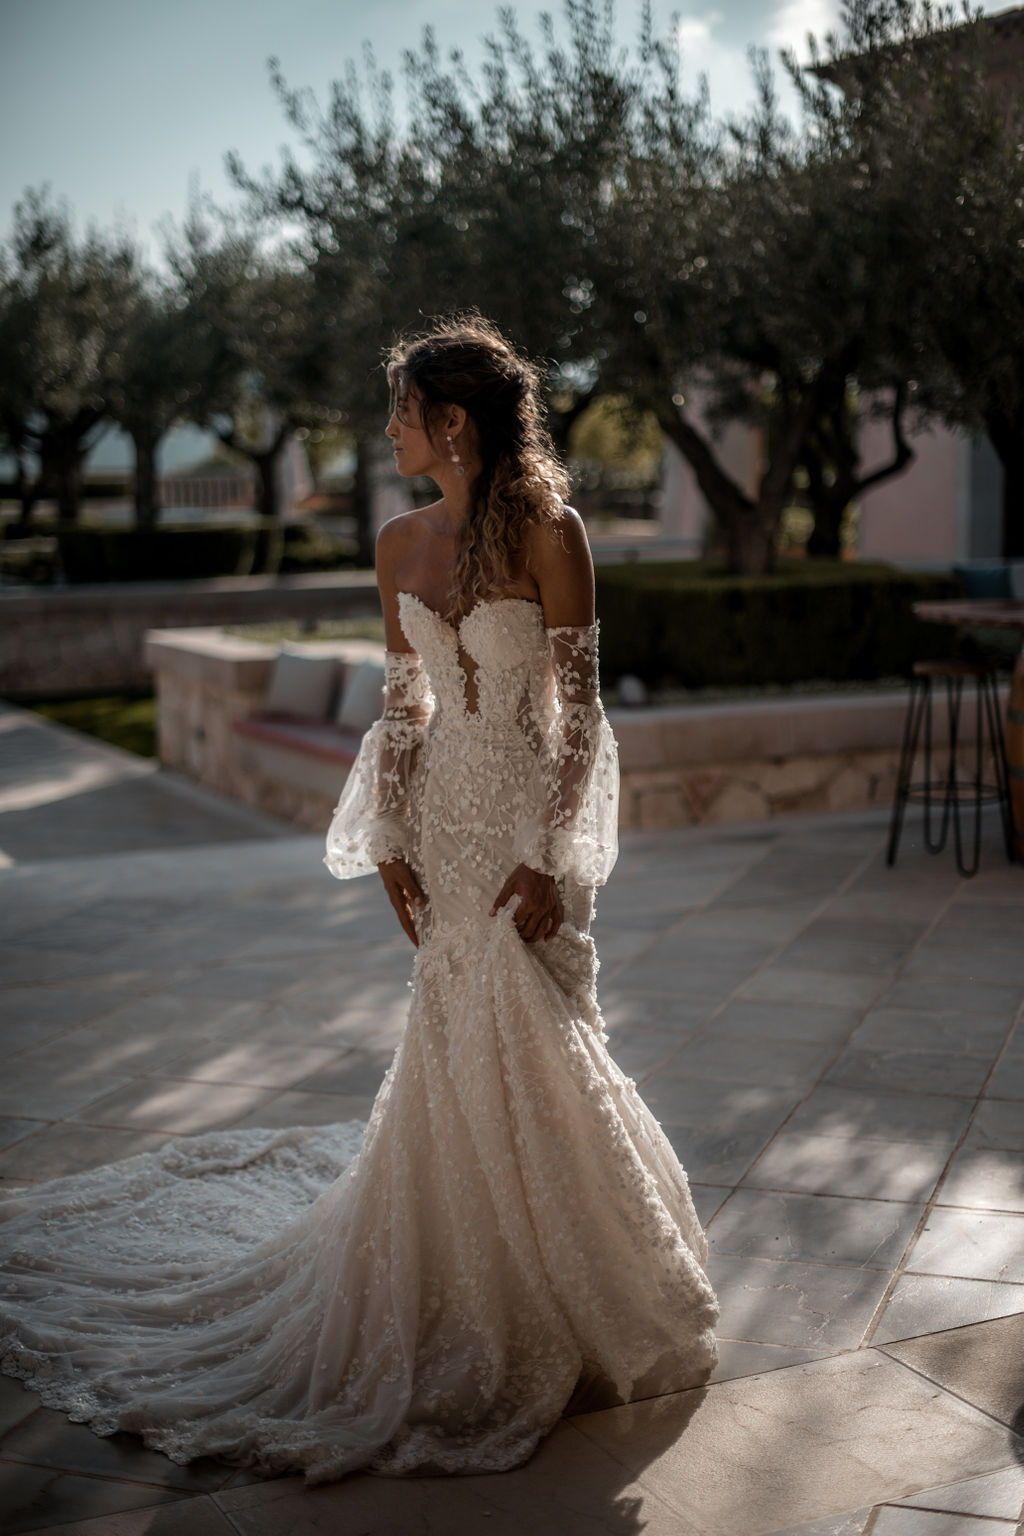 Gl M Couture Wedding Dress Trends More Galia Lahav Teal Bridesmaid Dresses Wedding Dresses Dream Wedding Dresses